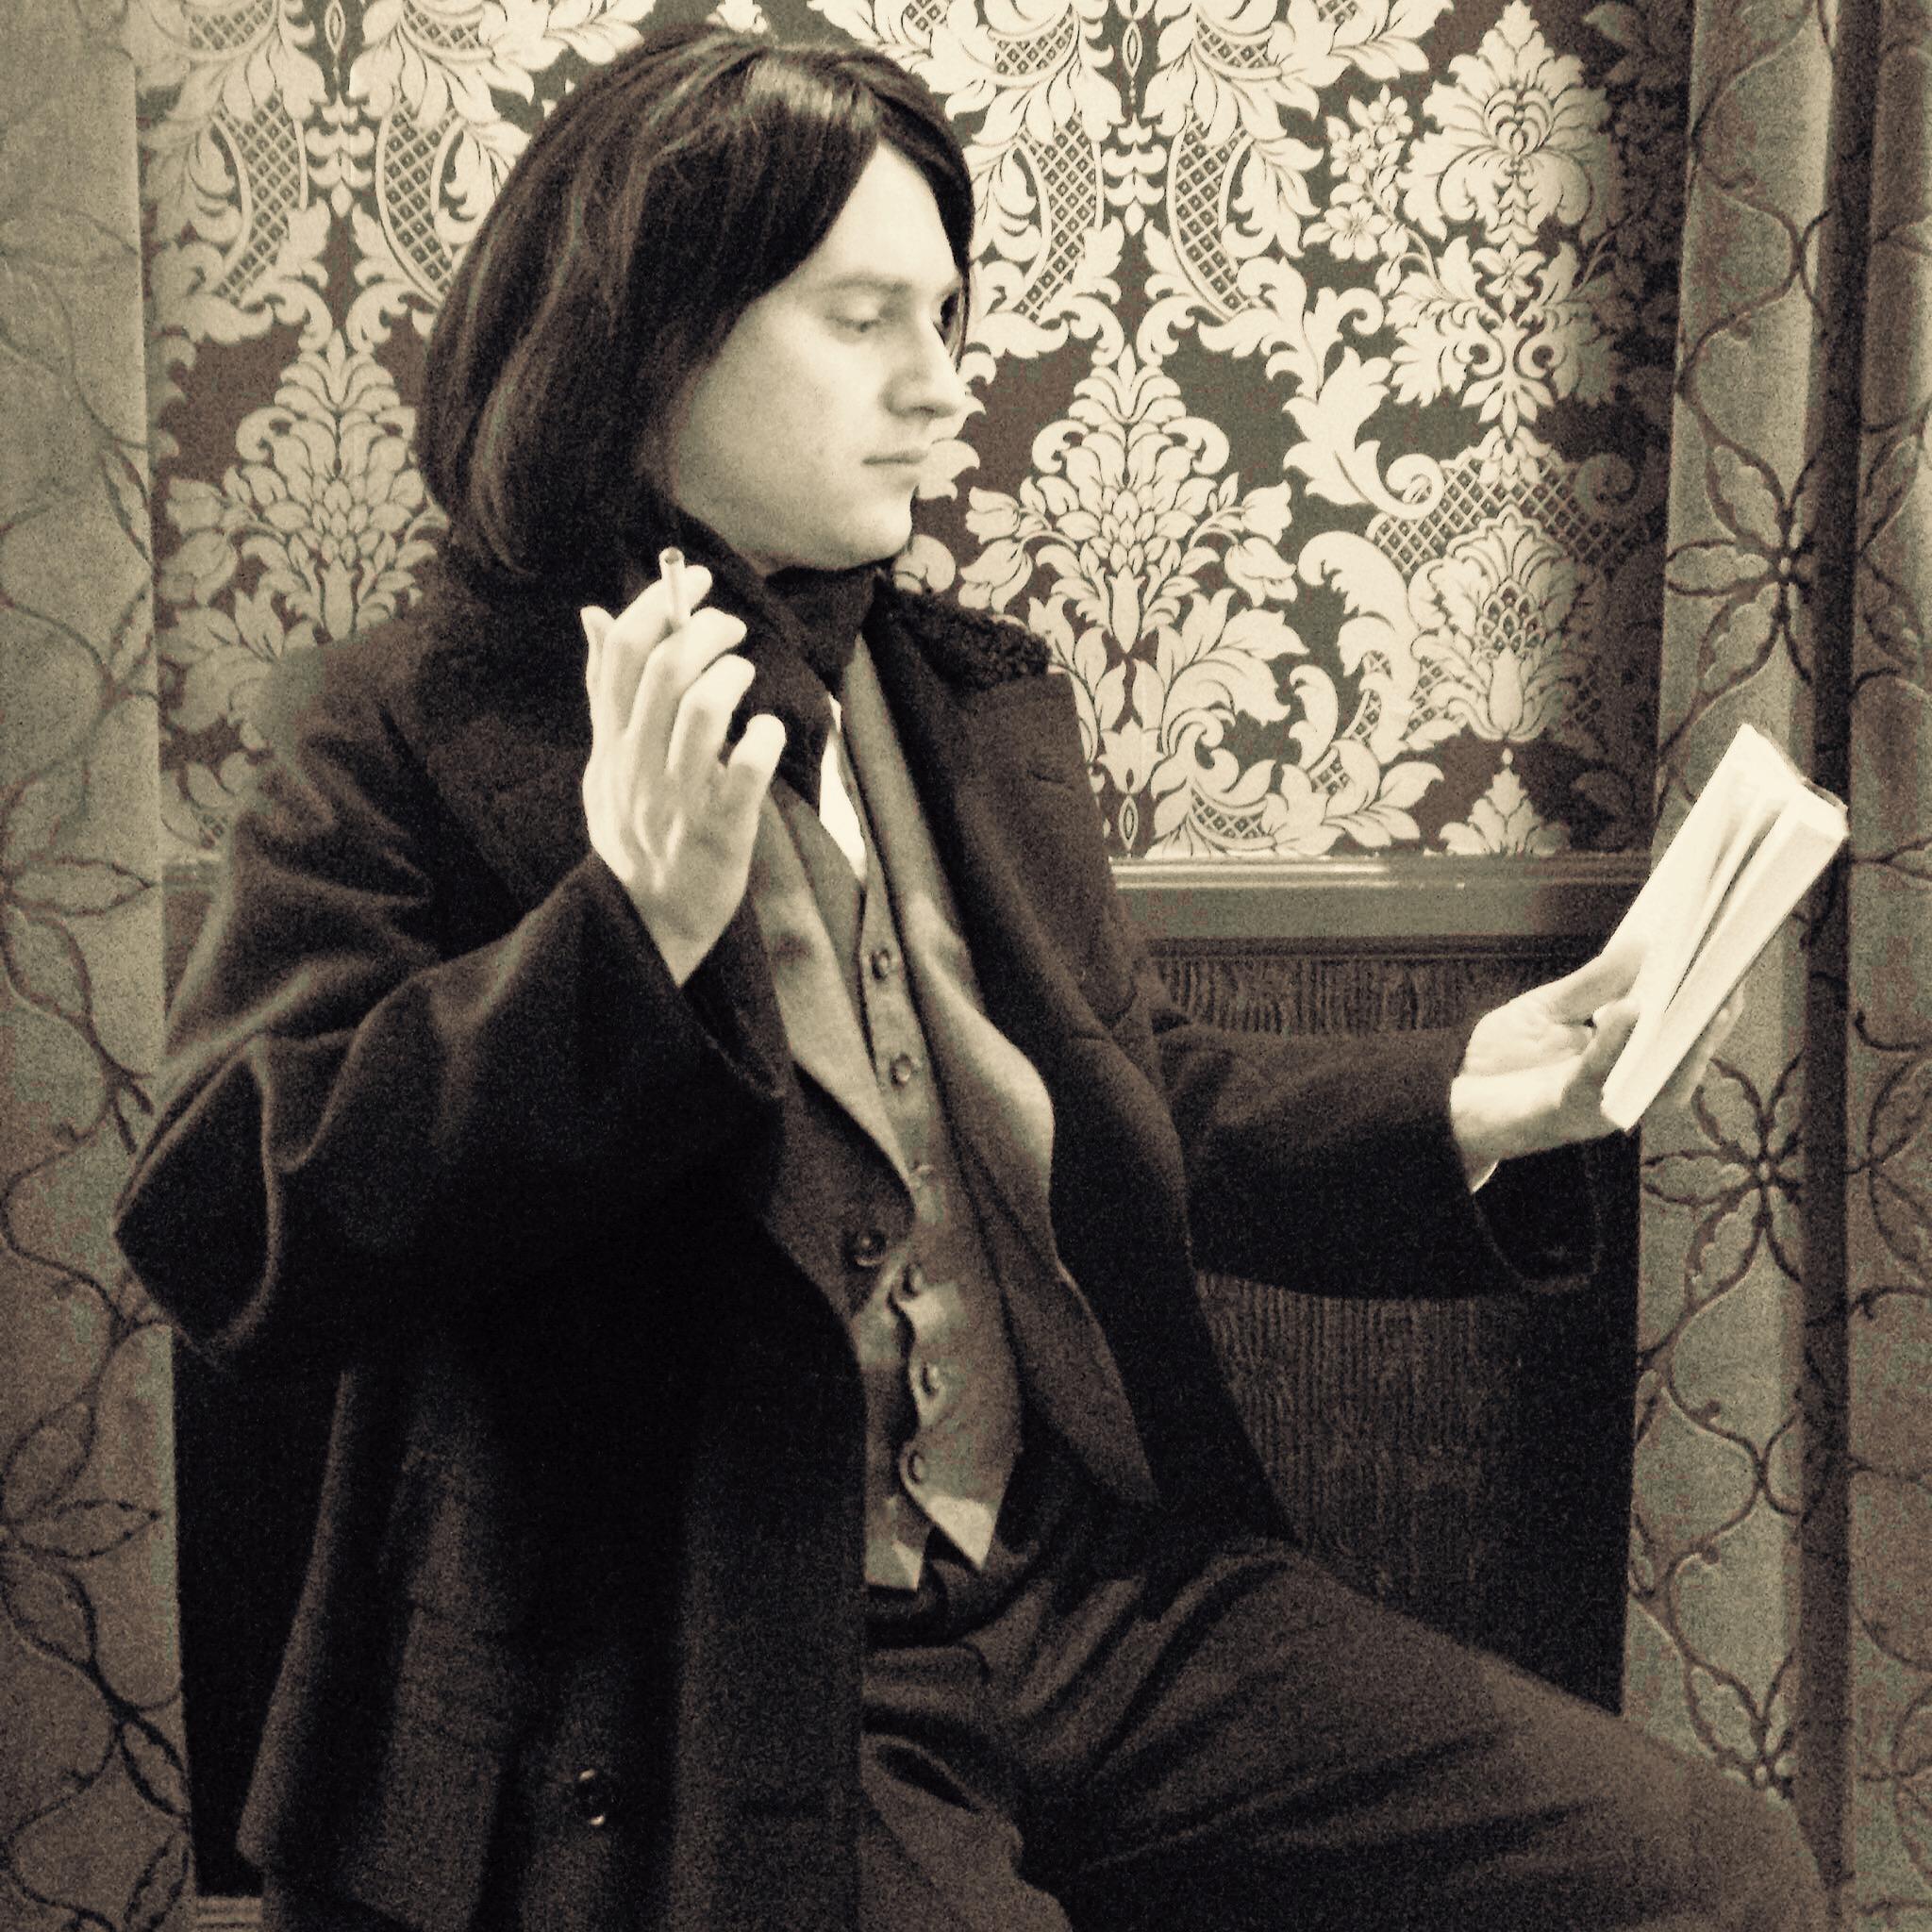 Philip as Oscar Wilde